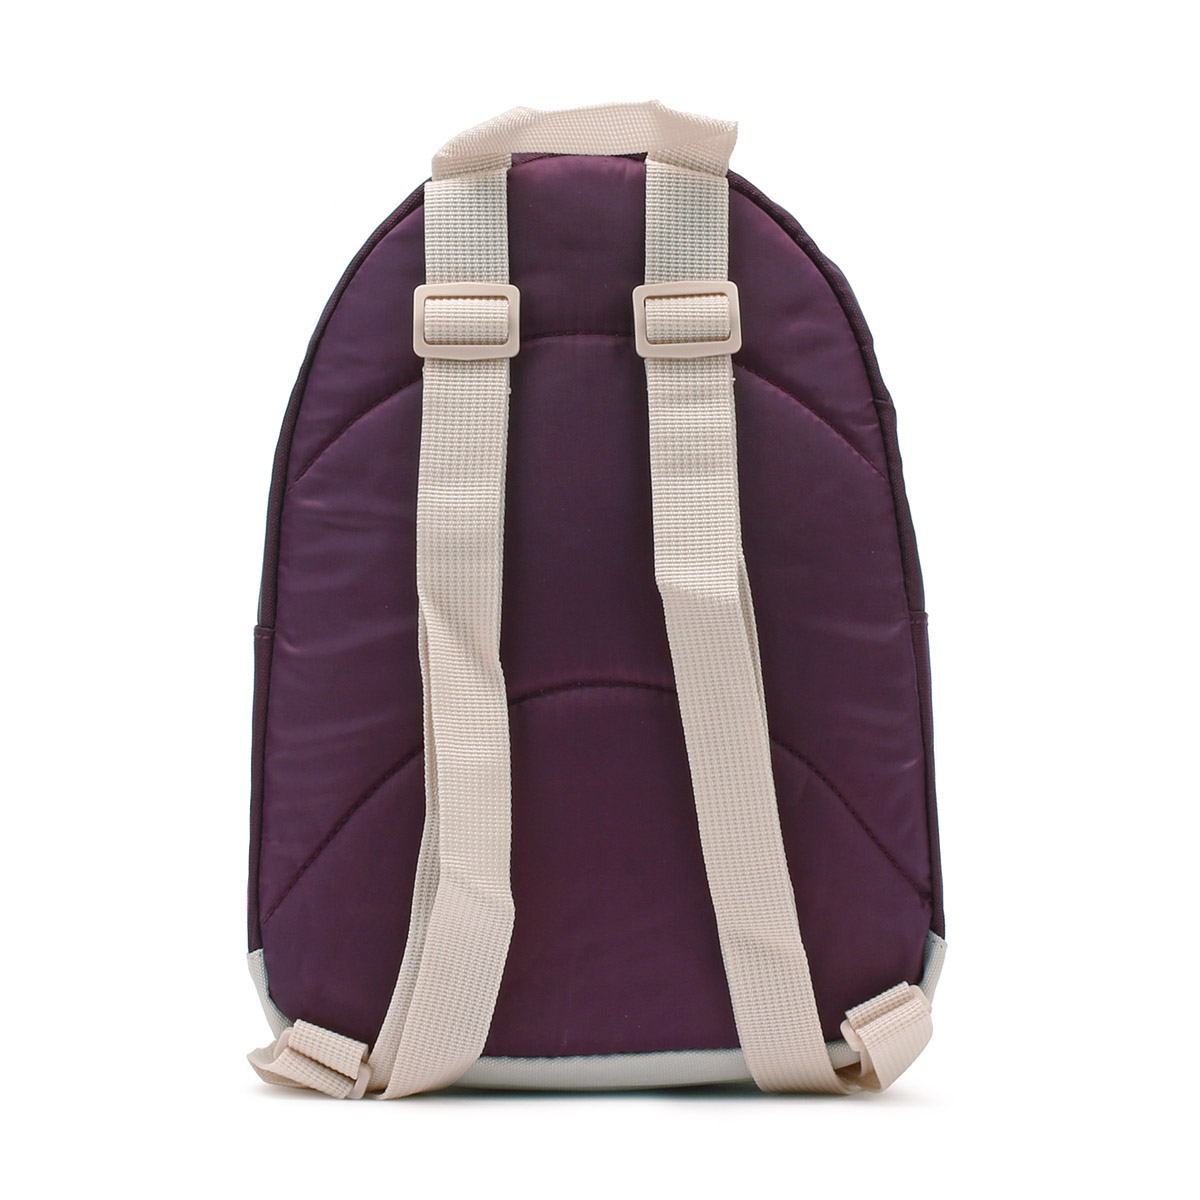 663babdf1681e New Balance Claret Burgundy Mini Classic Backpack Travel Laptop Sleeve Bag